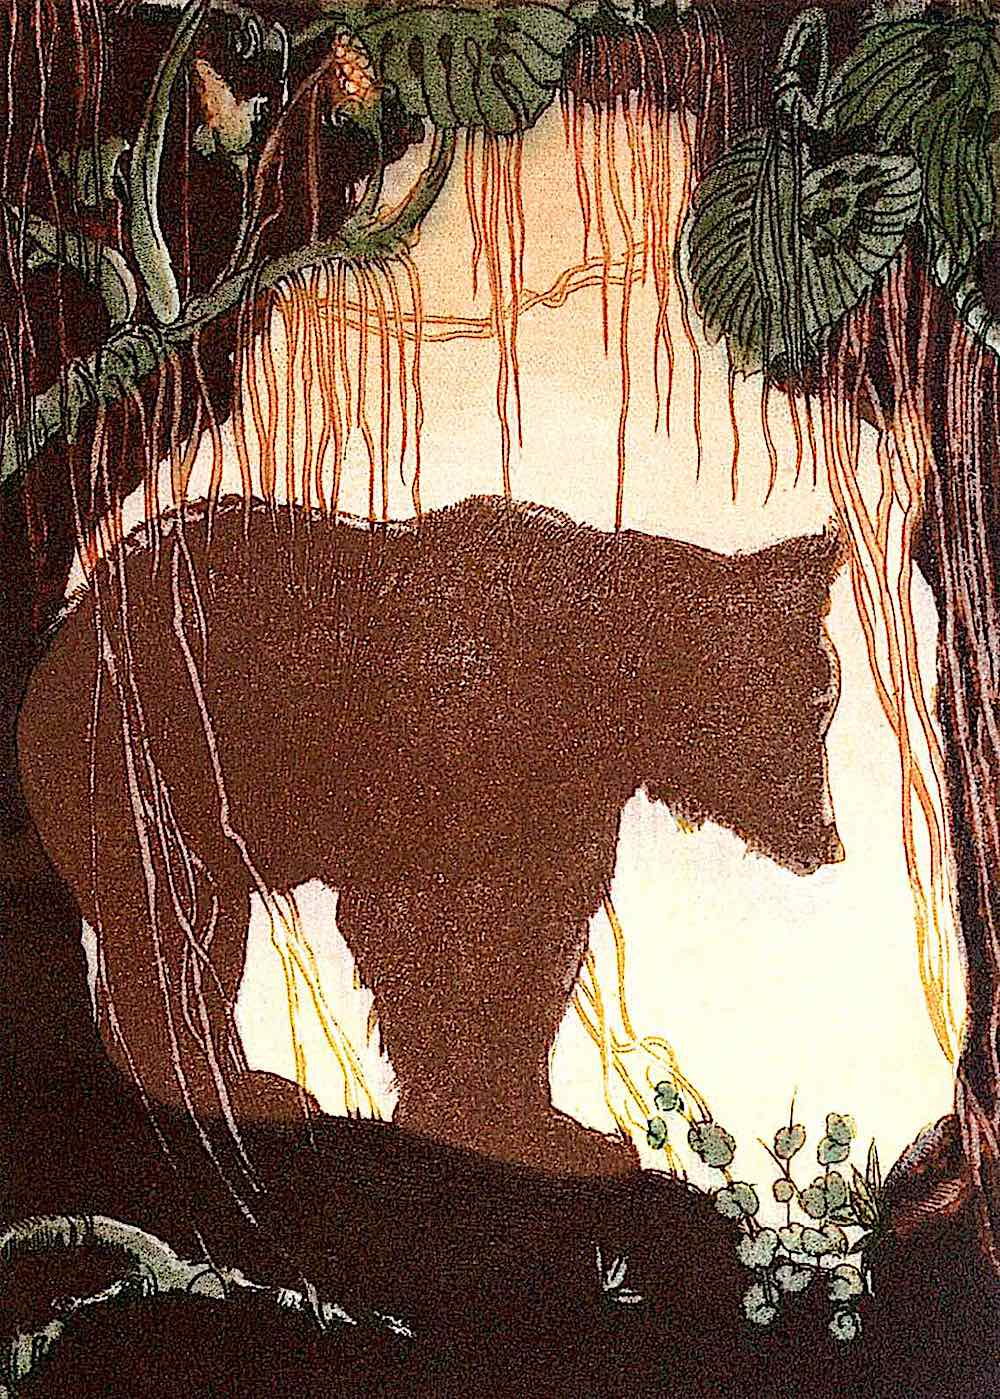 M. De Becque, a silhouette of a bear at a cave entrance